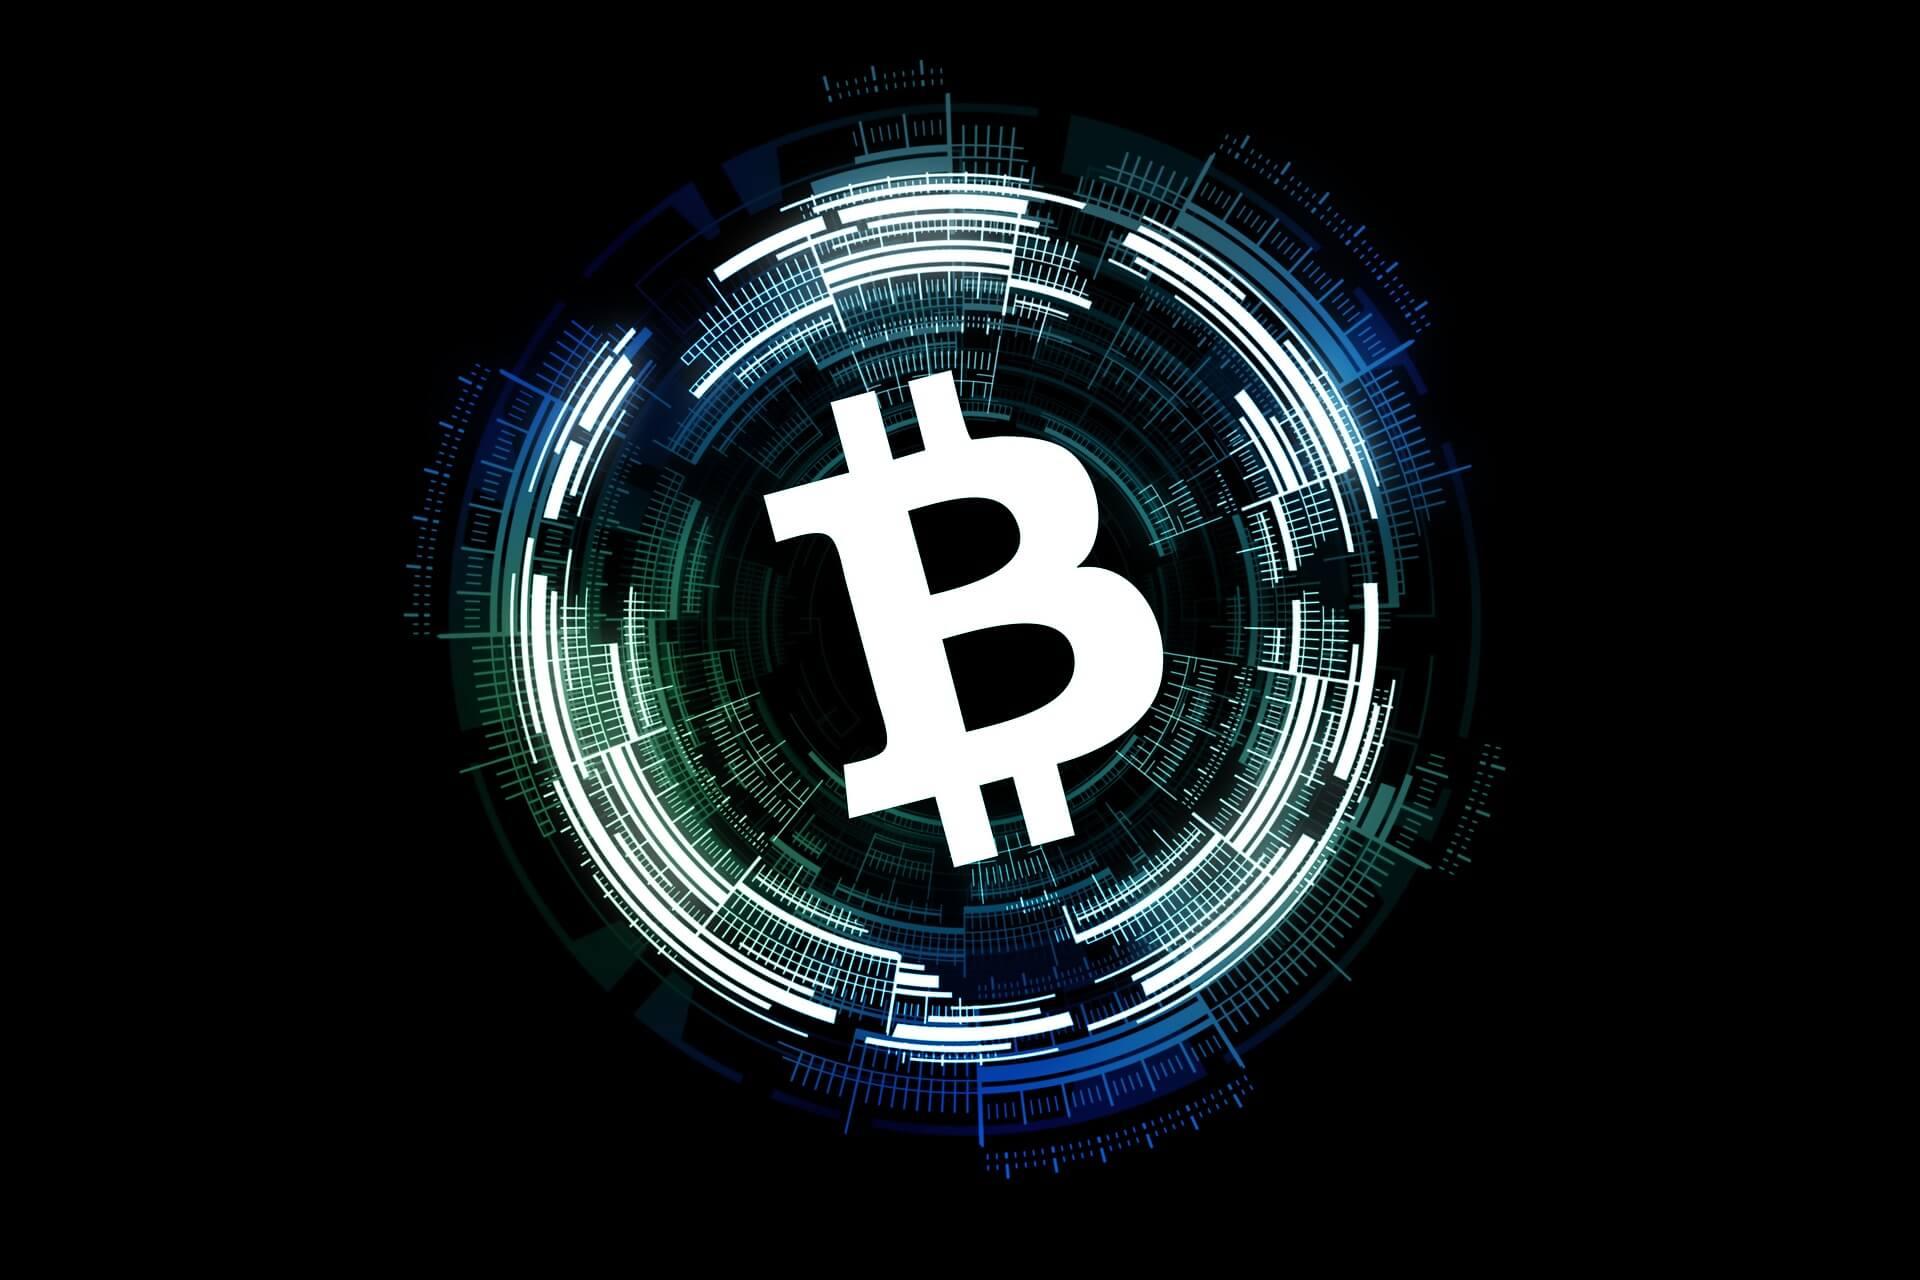 Effective Bitcoin Financial Advice for 2019